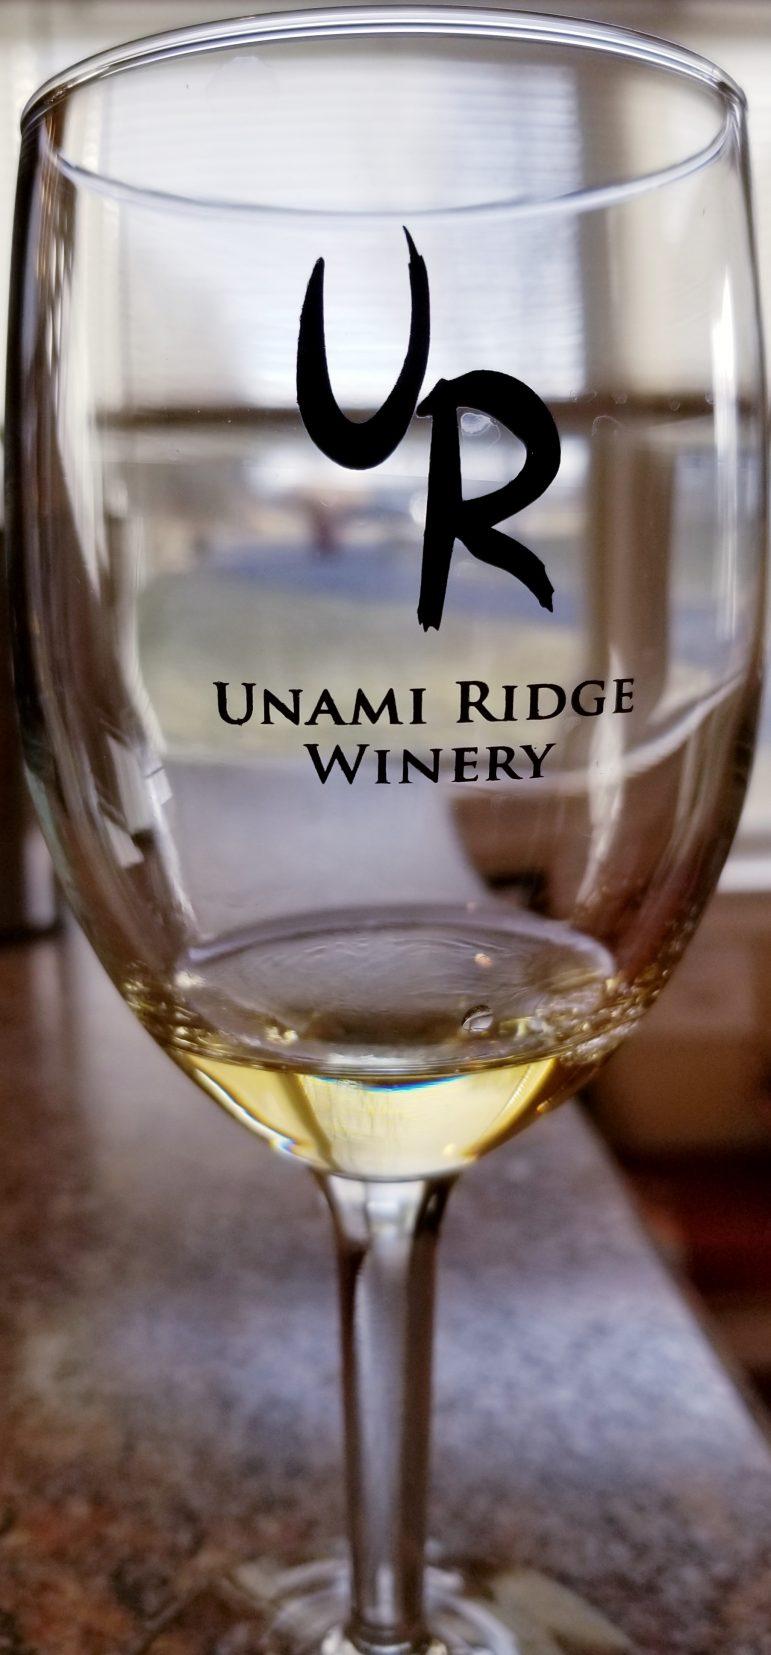 Unami Ridge wine